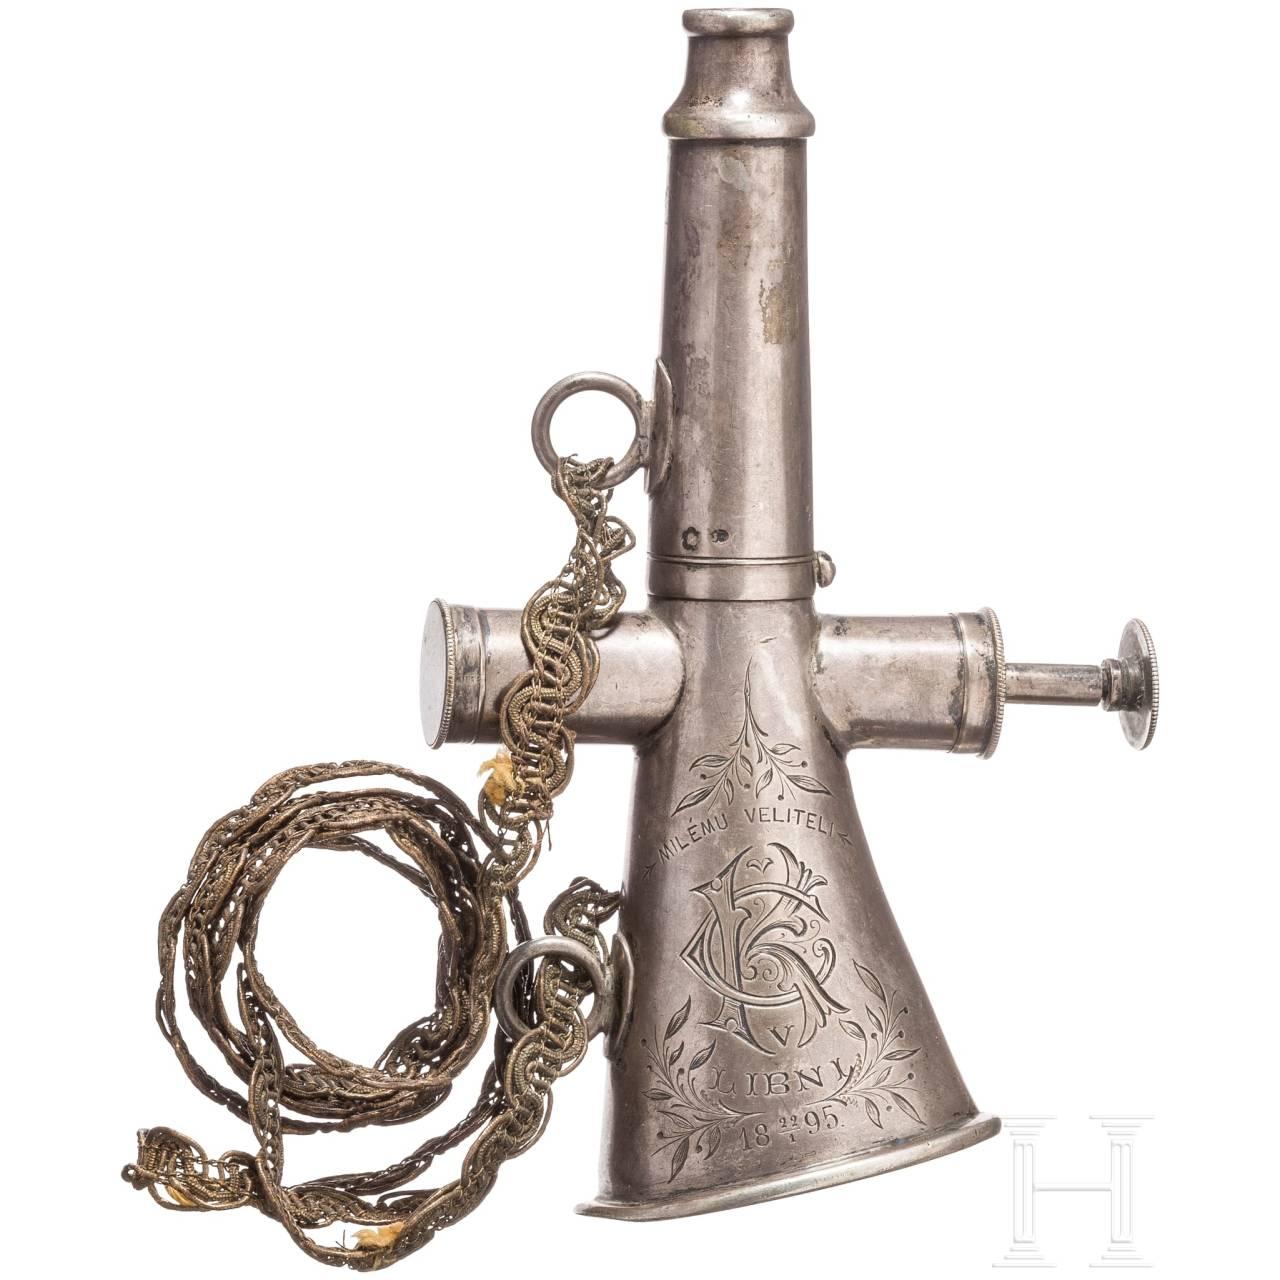 Silbernes Feuerwehrhorn, datiert 1895